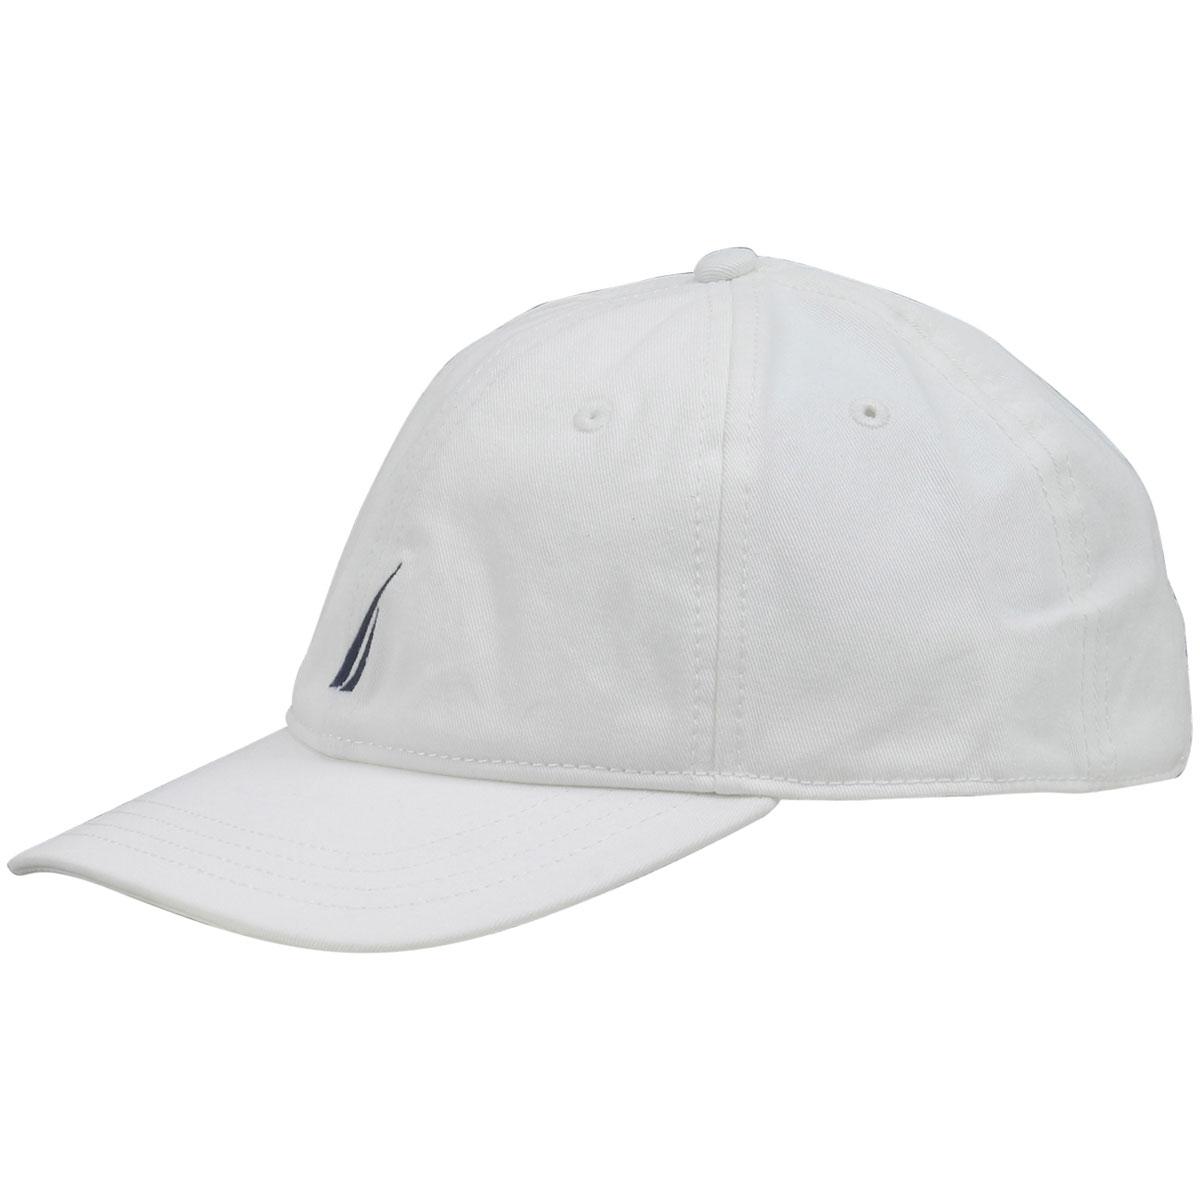 Nautica Anchor J-Class White Cotton Cap Baseball Hat (One Size Fits ... a62e0b4036b8